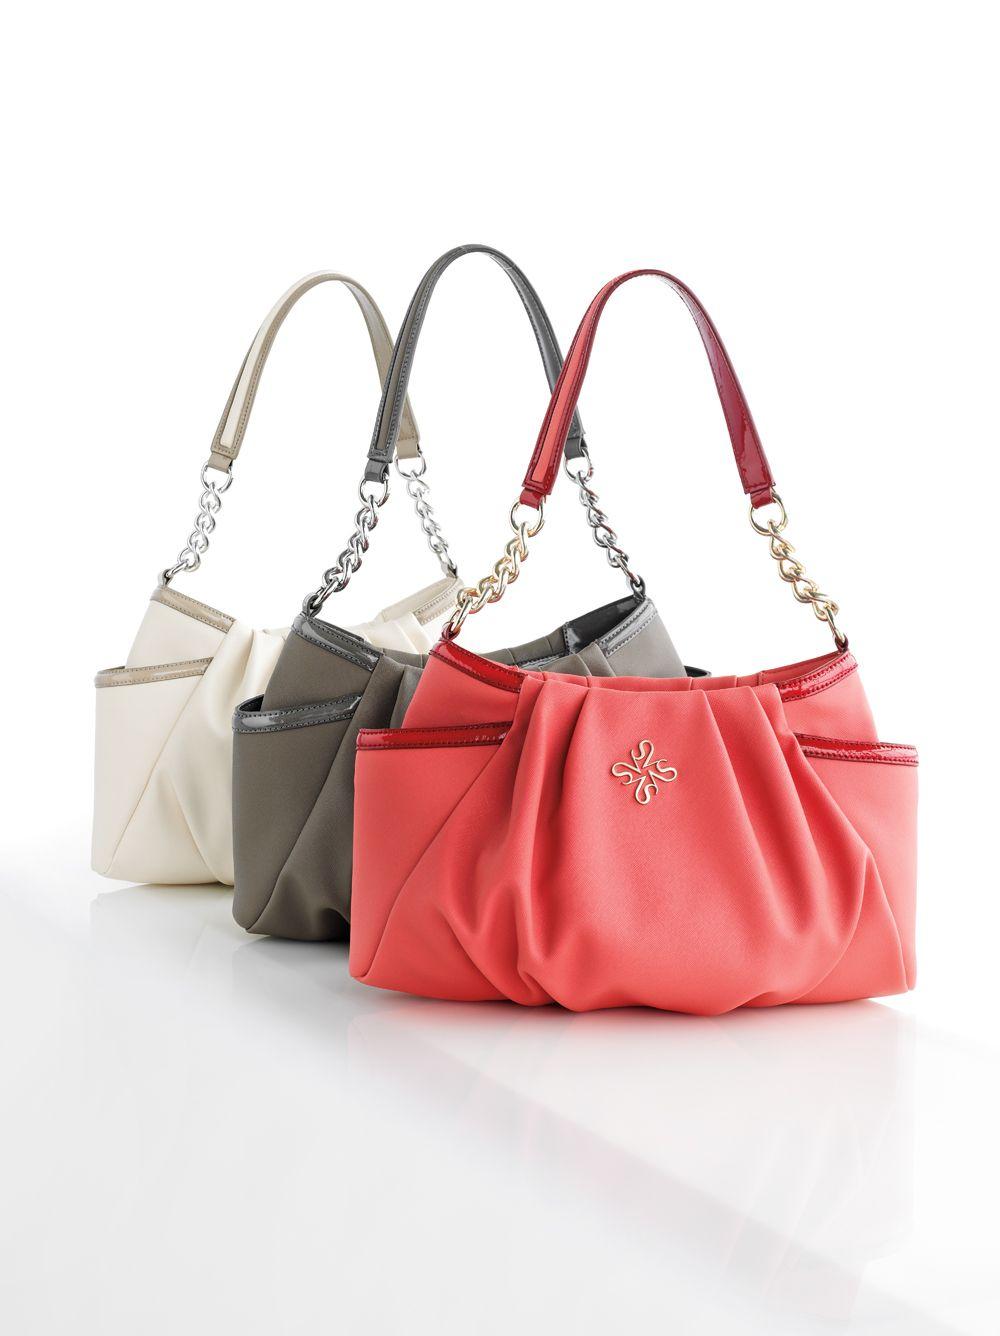 New Women Simply Plain Classic Designe Top-Handle Bag Crossbody Shoulder Handbag